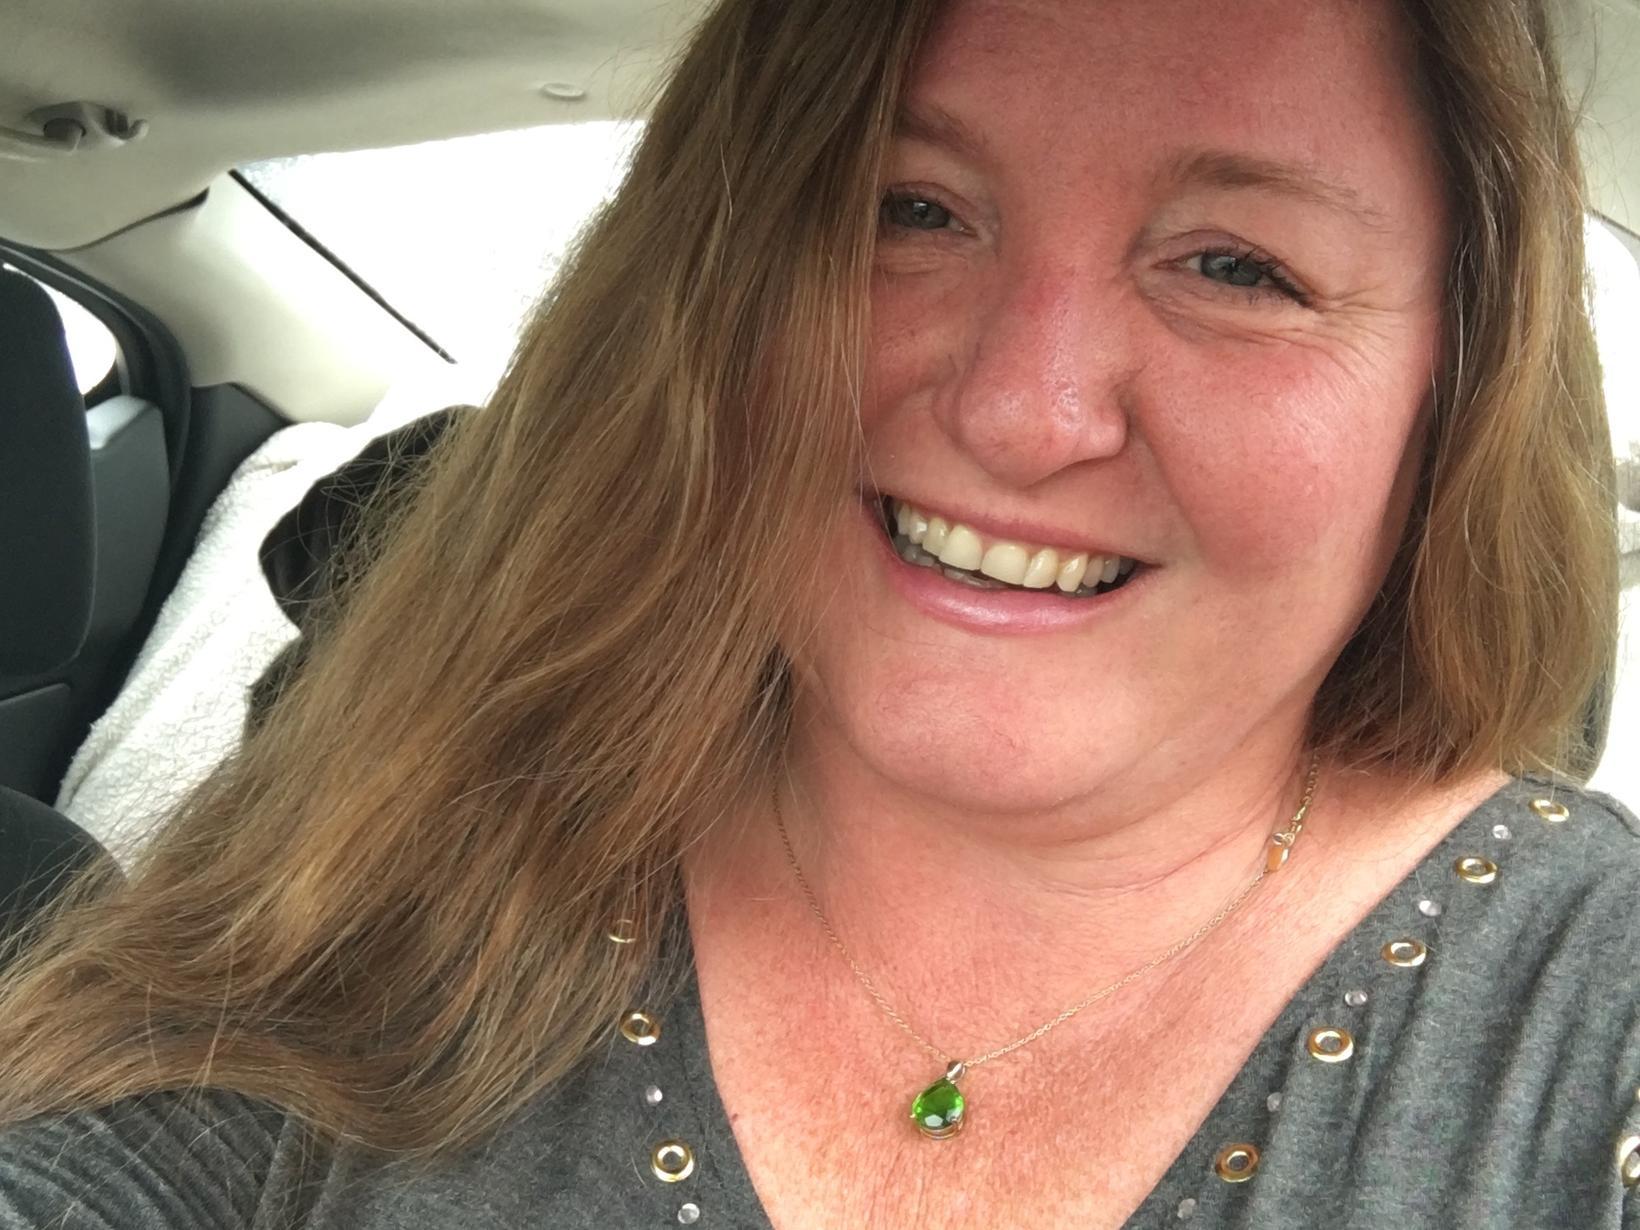 Vandra from Sherwood, Arkansas, United States